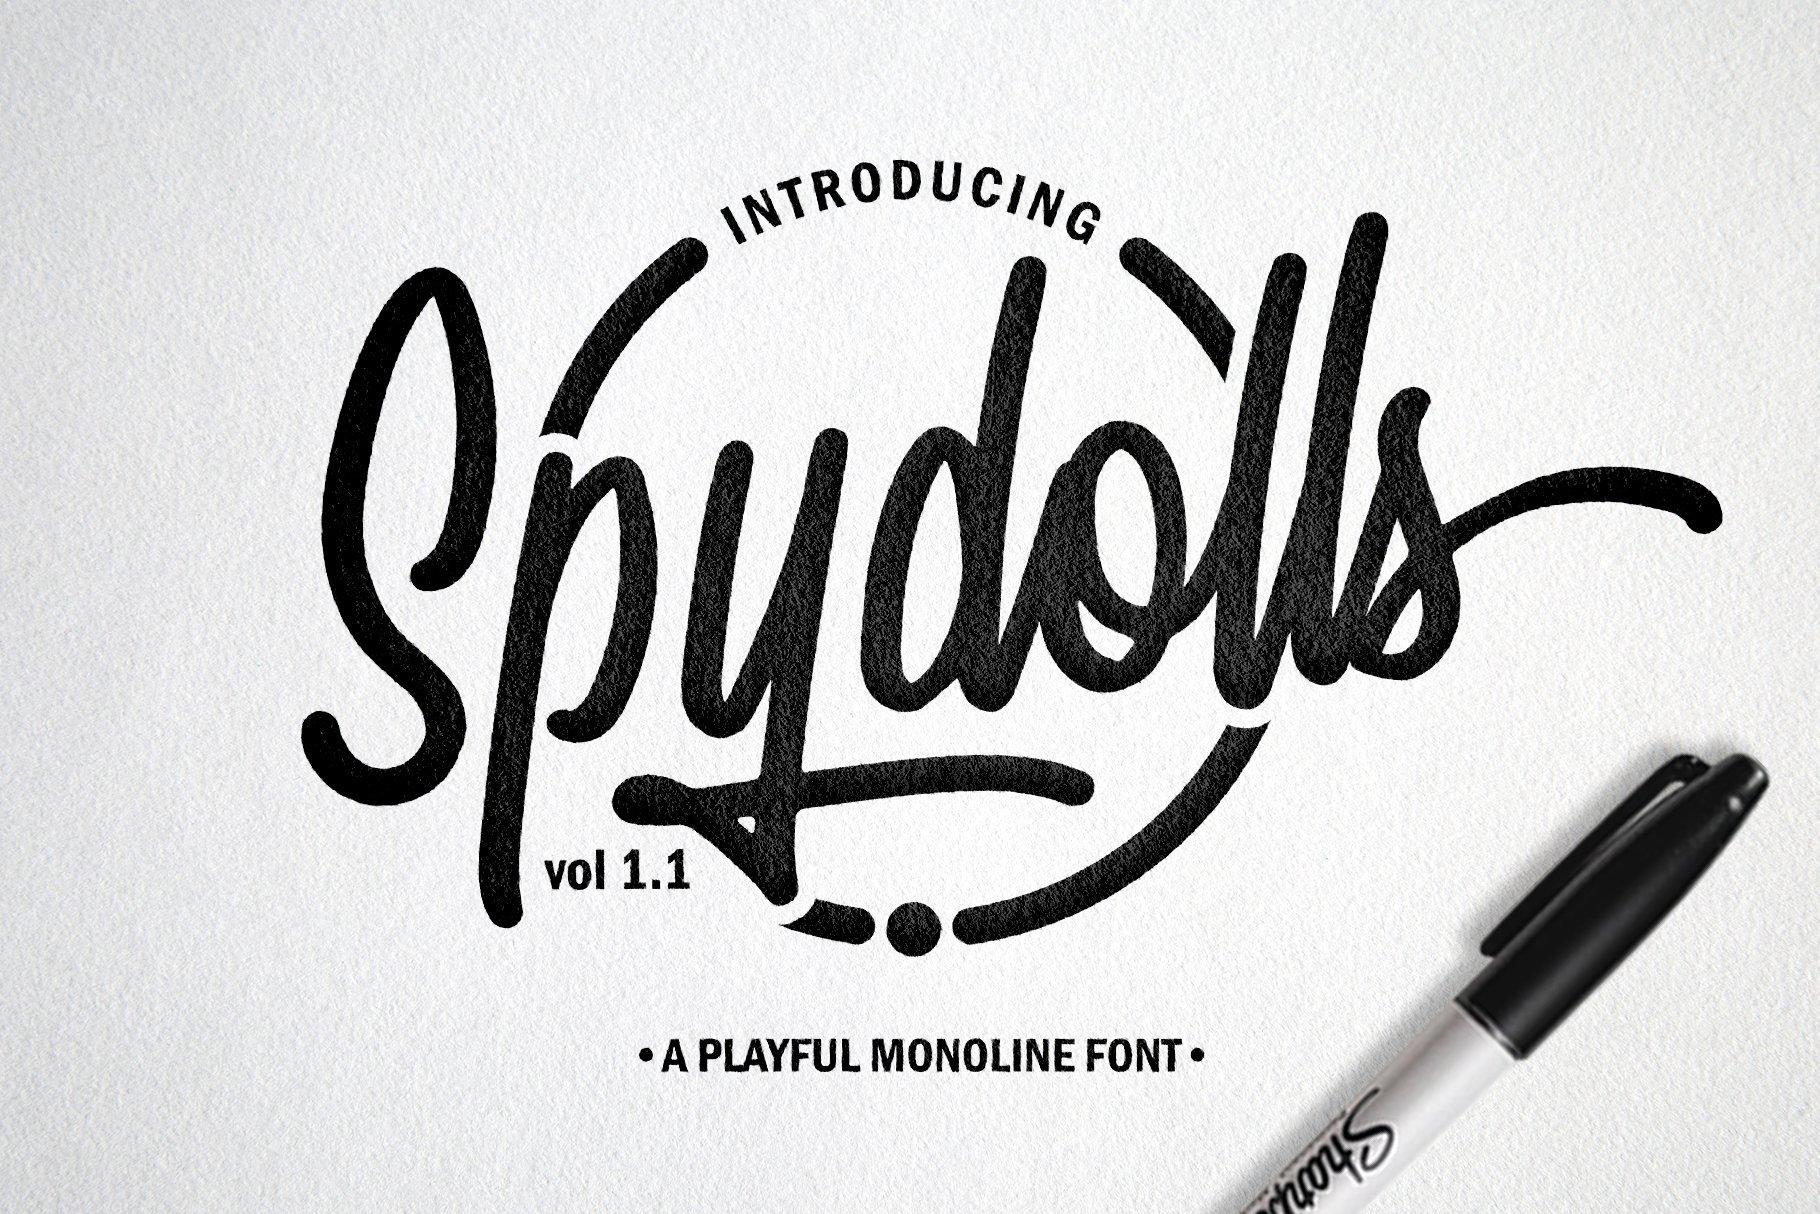 https://fontclarity.com/wp-content/uploads/2019/09/spydolls-script-font-download-0.jpg Free Download